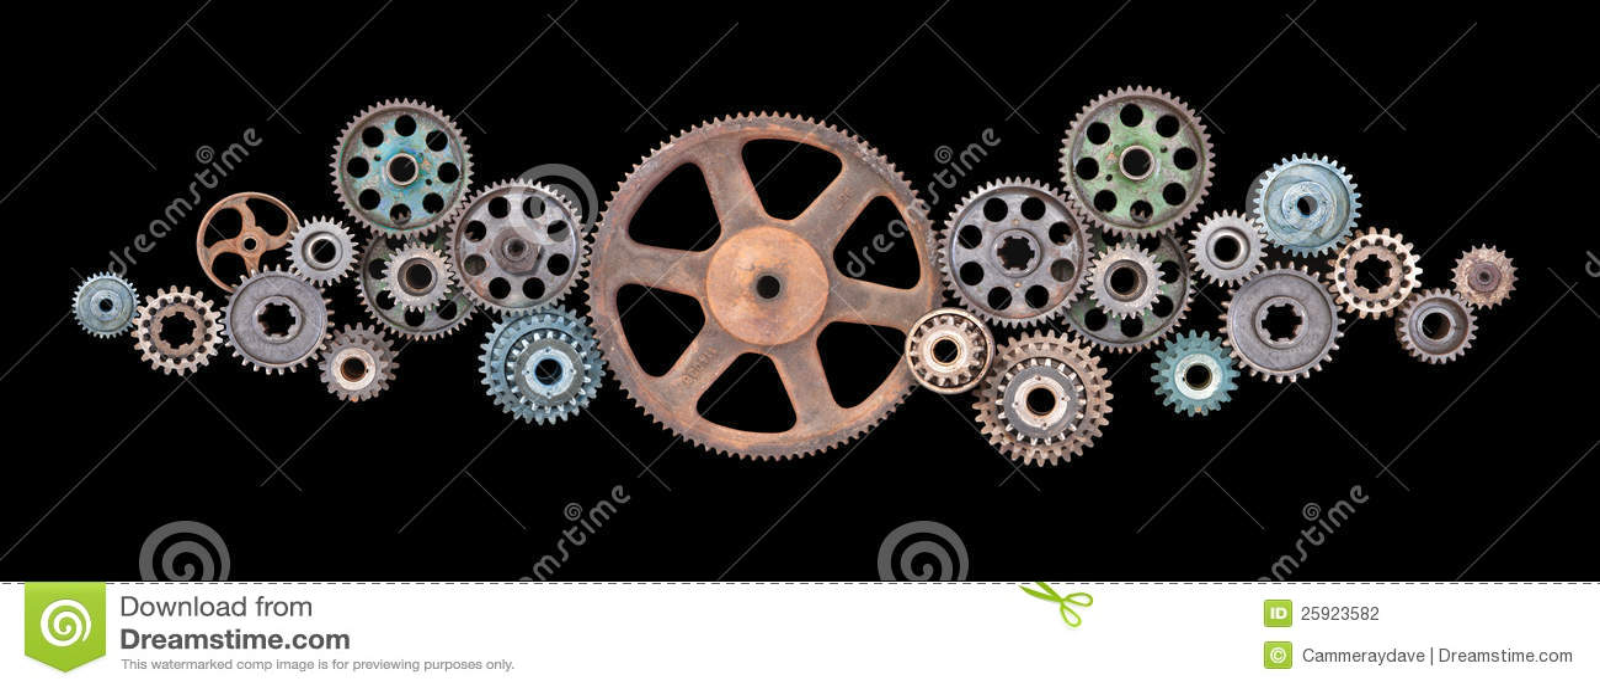 Retro kuggekugghjul